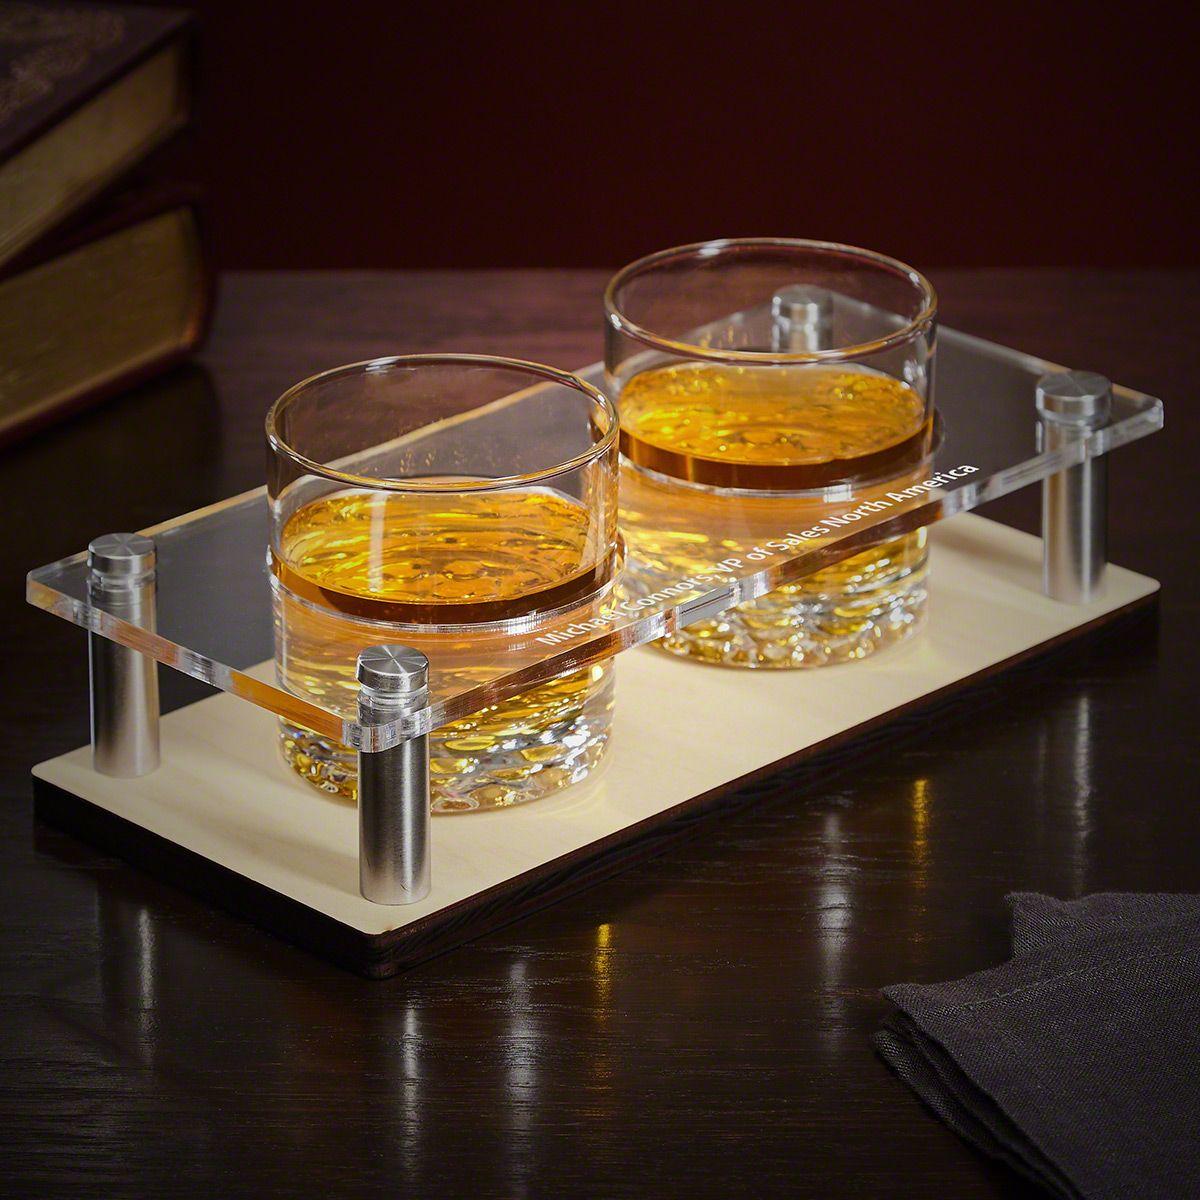 Buckman Executive Presentation Set with Whiskey Glasses 3 pc